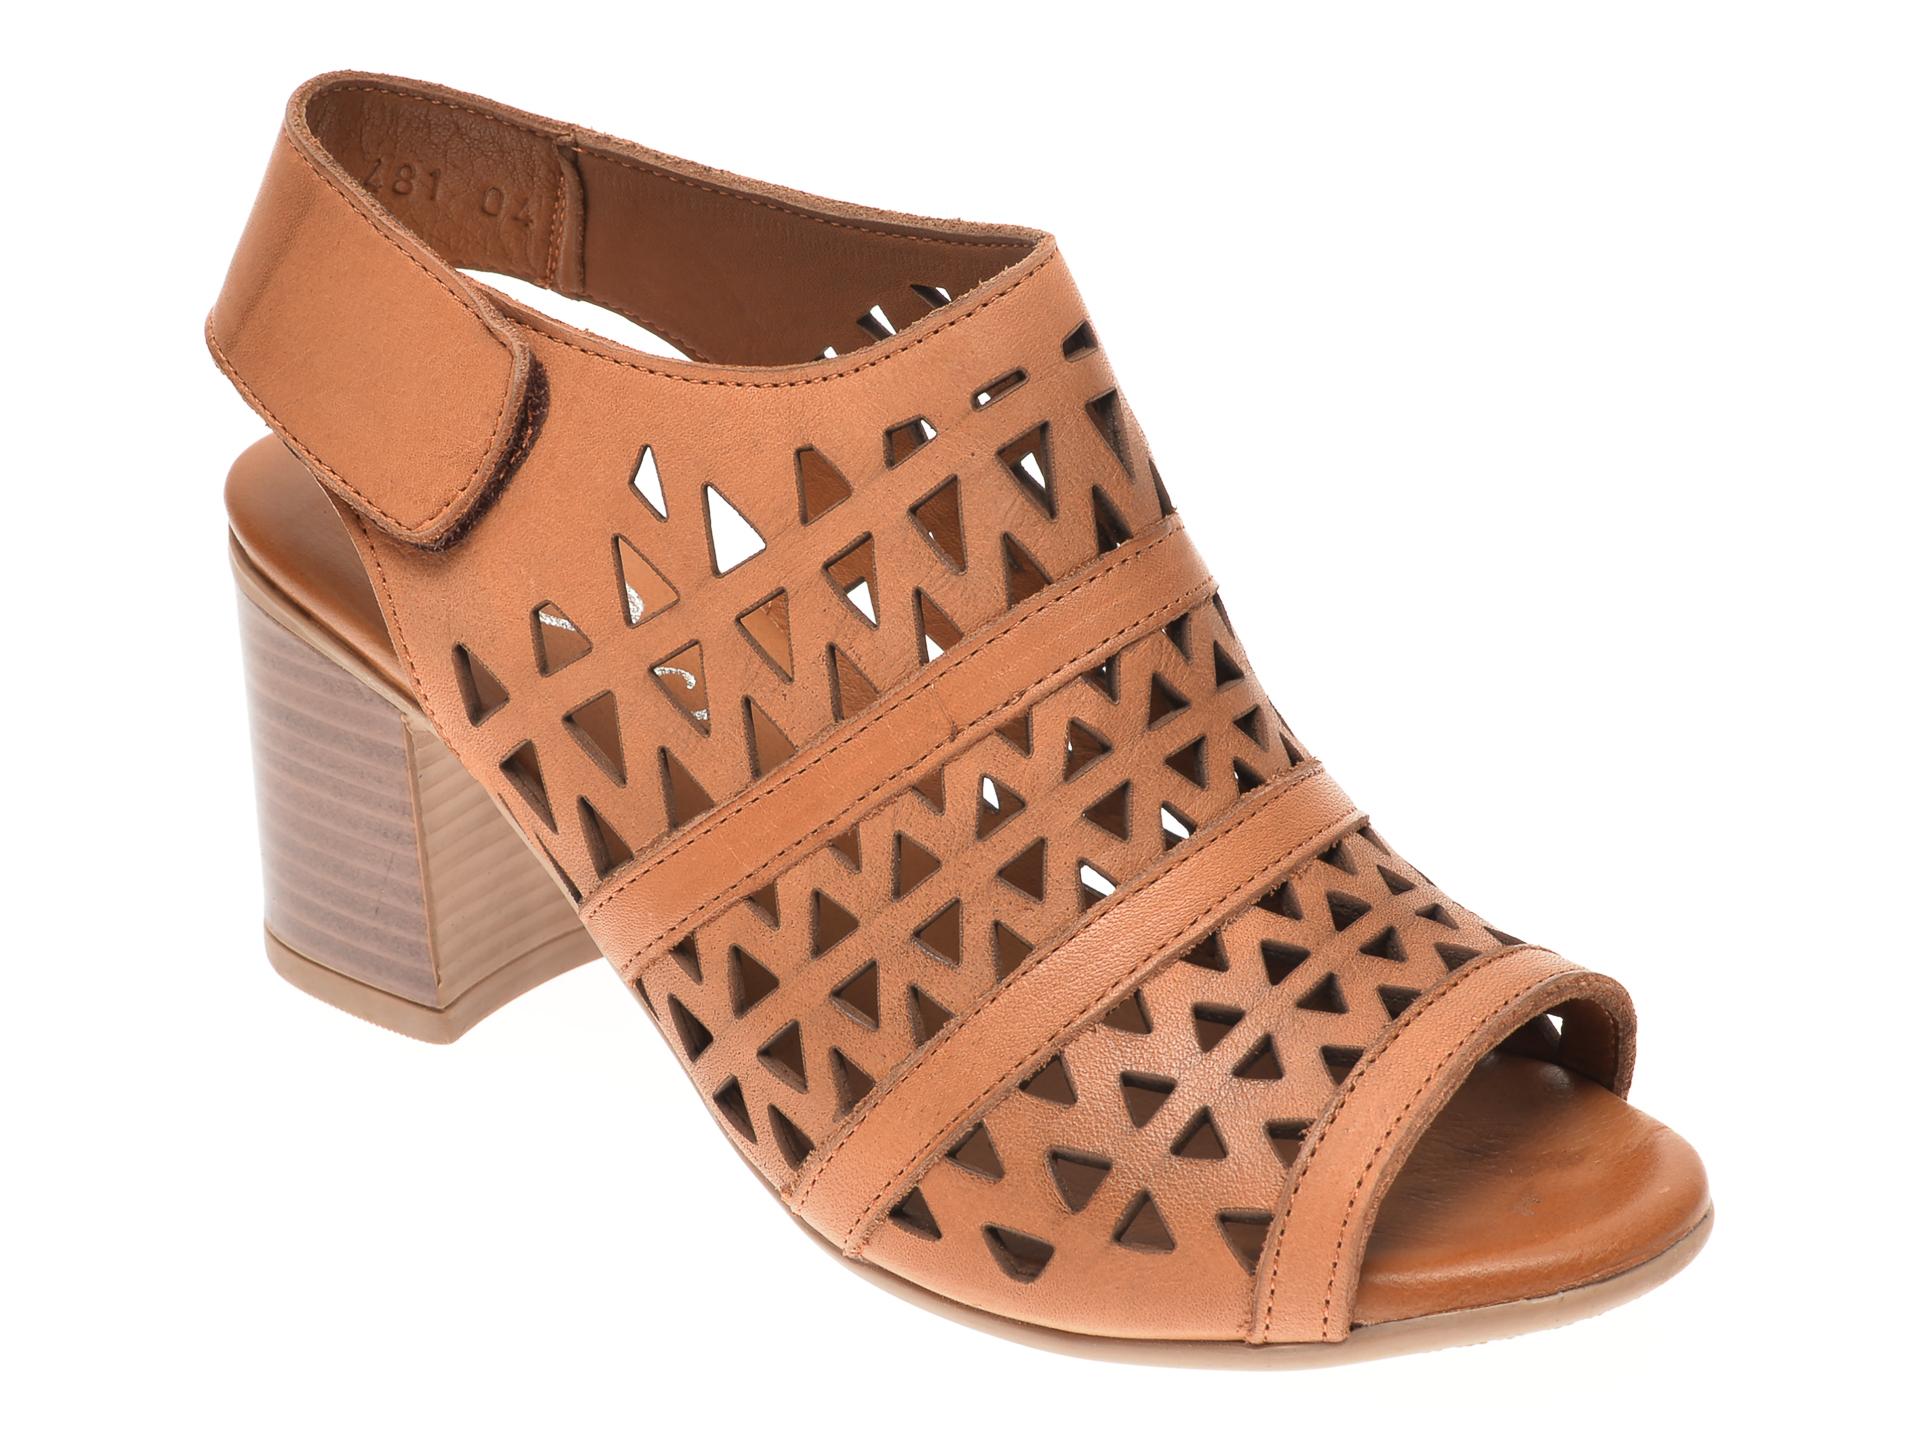 Sandale DIVAS maro, 409481, din piele naturala